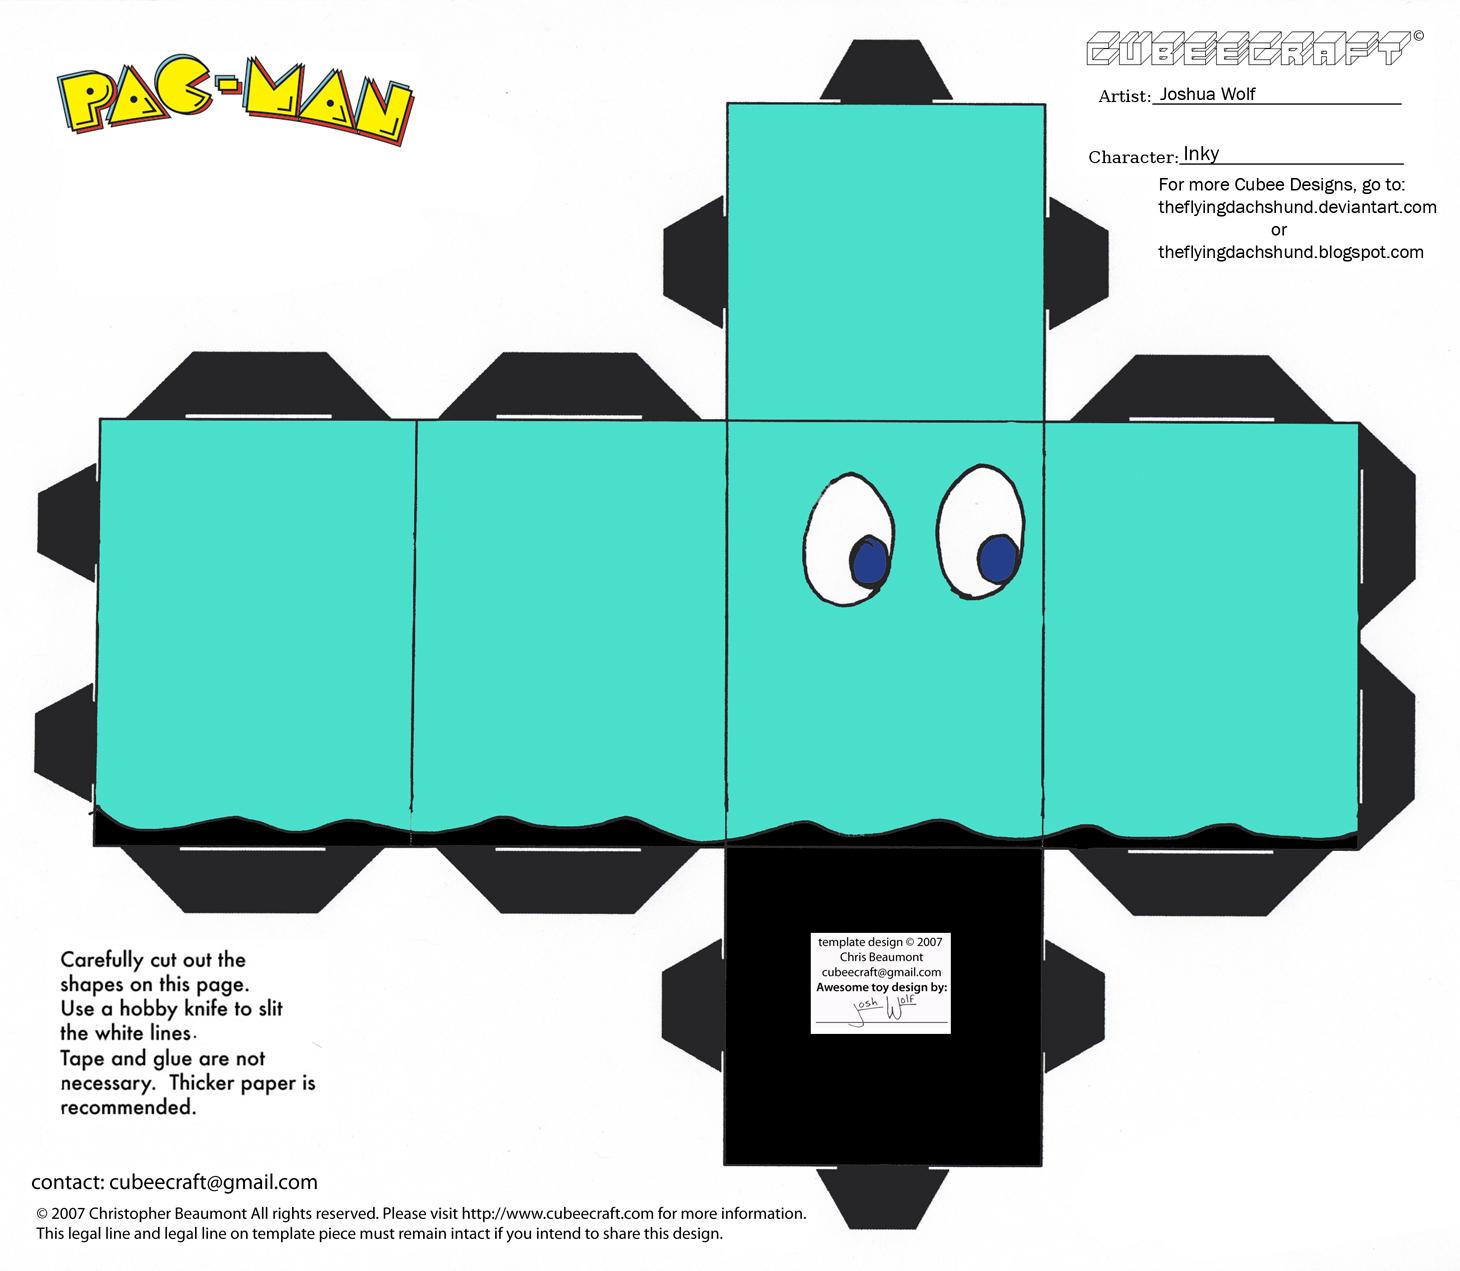 VG 2: Inky Cubee by TheFlyingDachshund